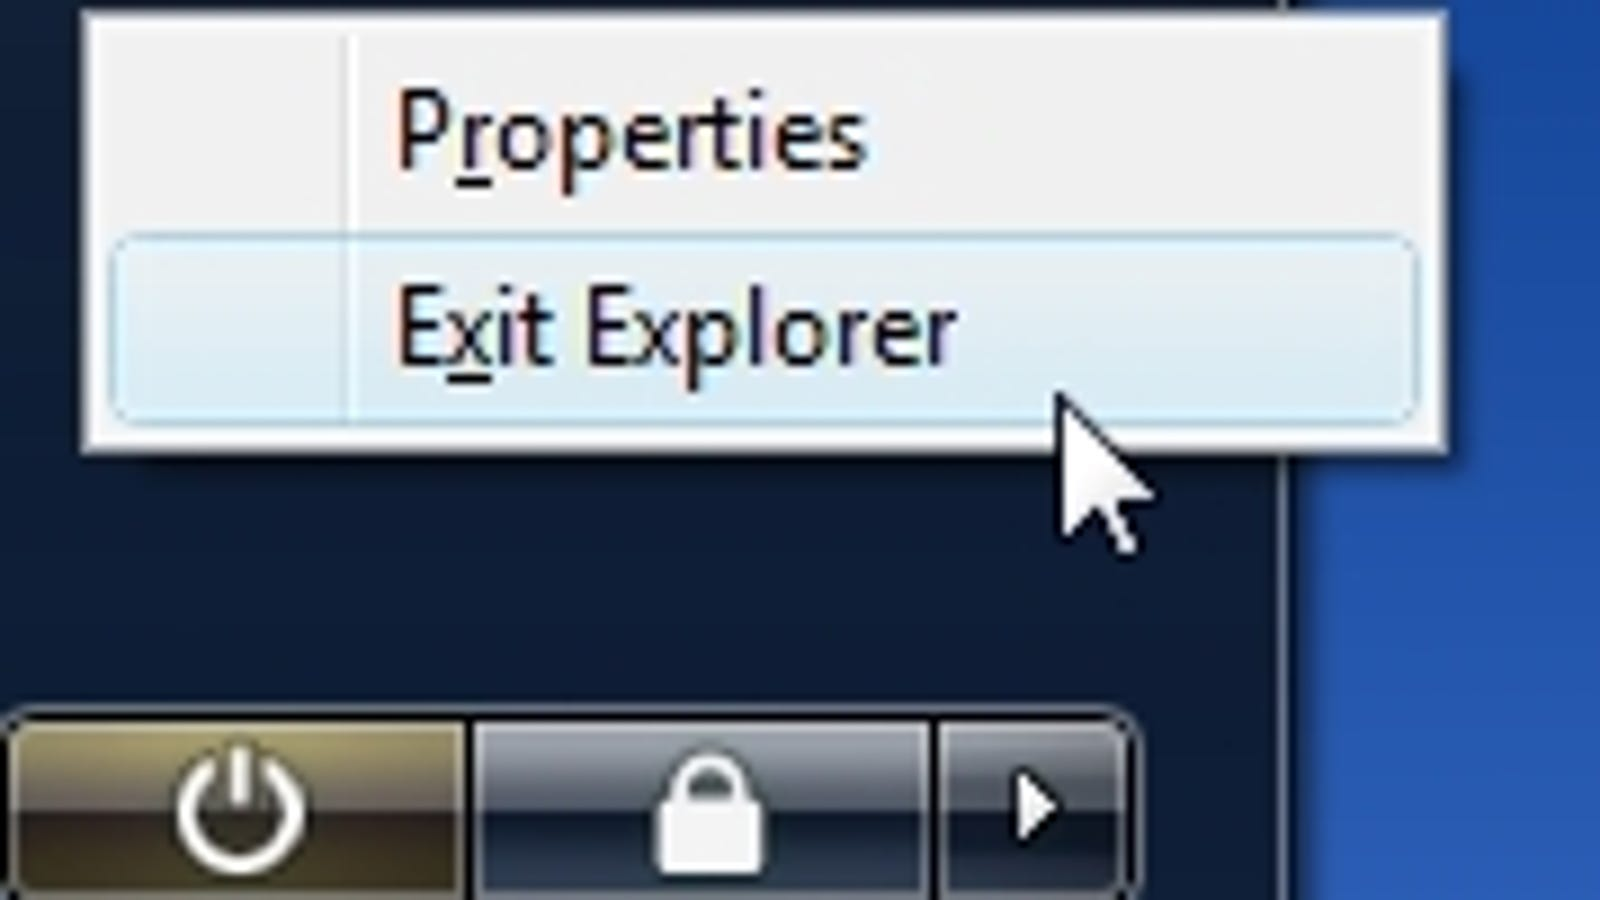 Restart Windows Explorer the Safe Way